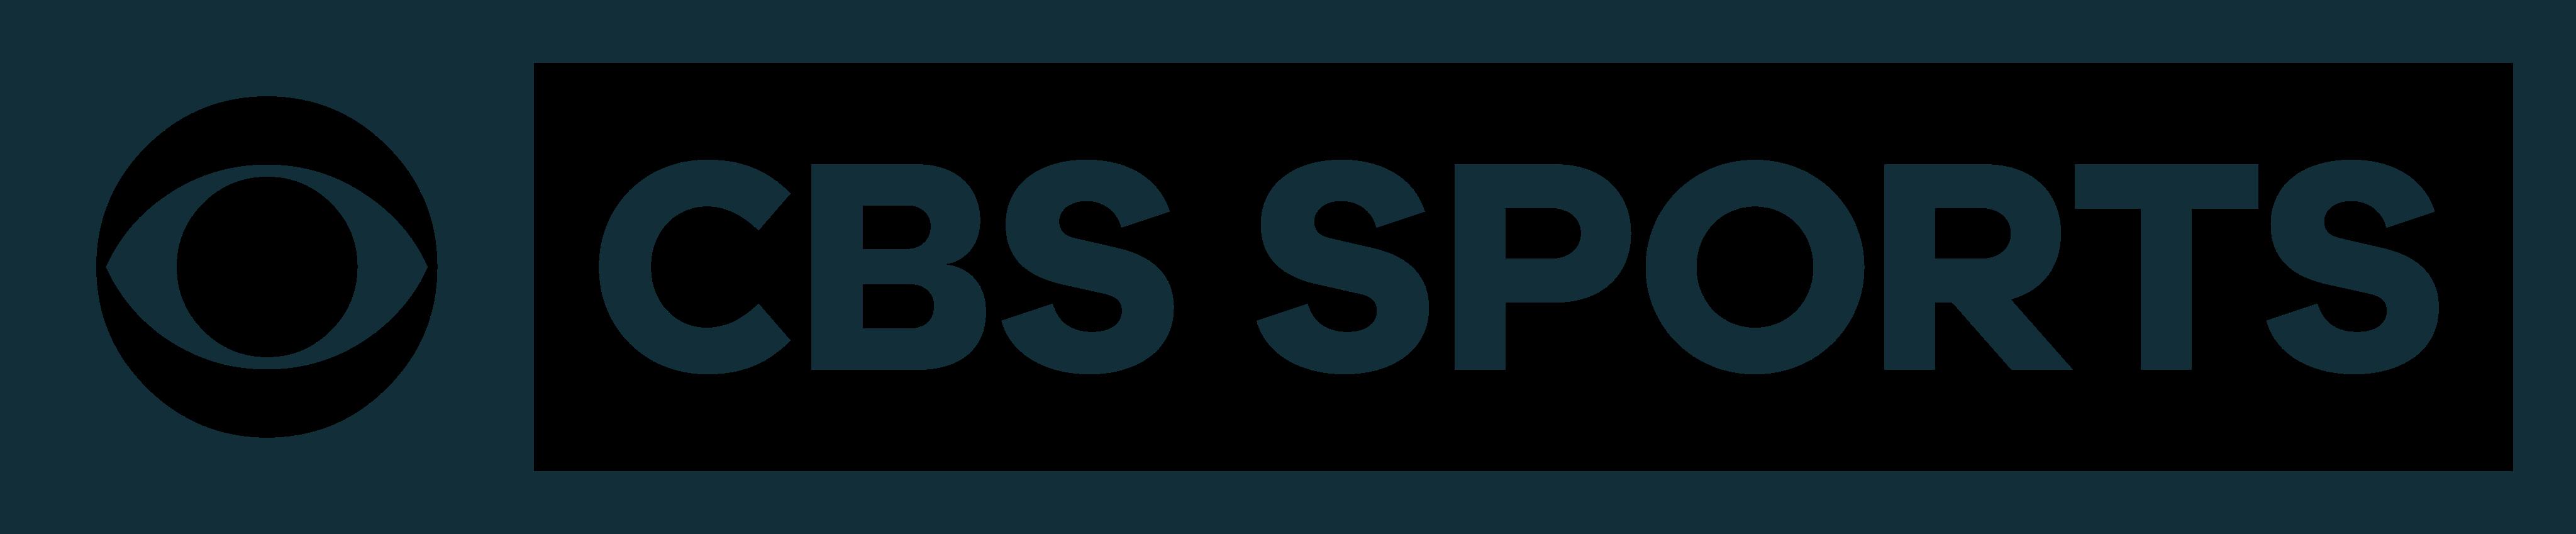 cbs sports logo - CBS Sports Logo